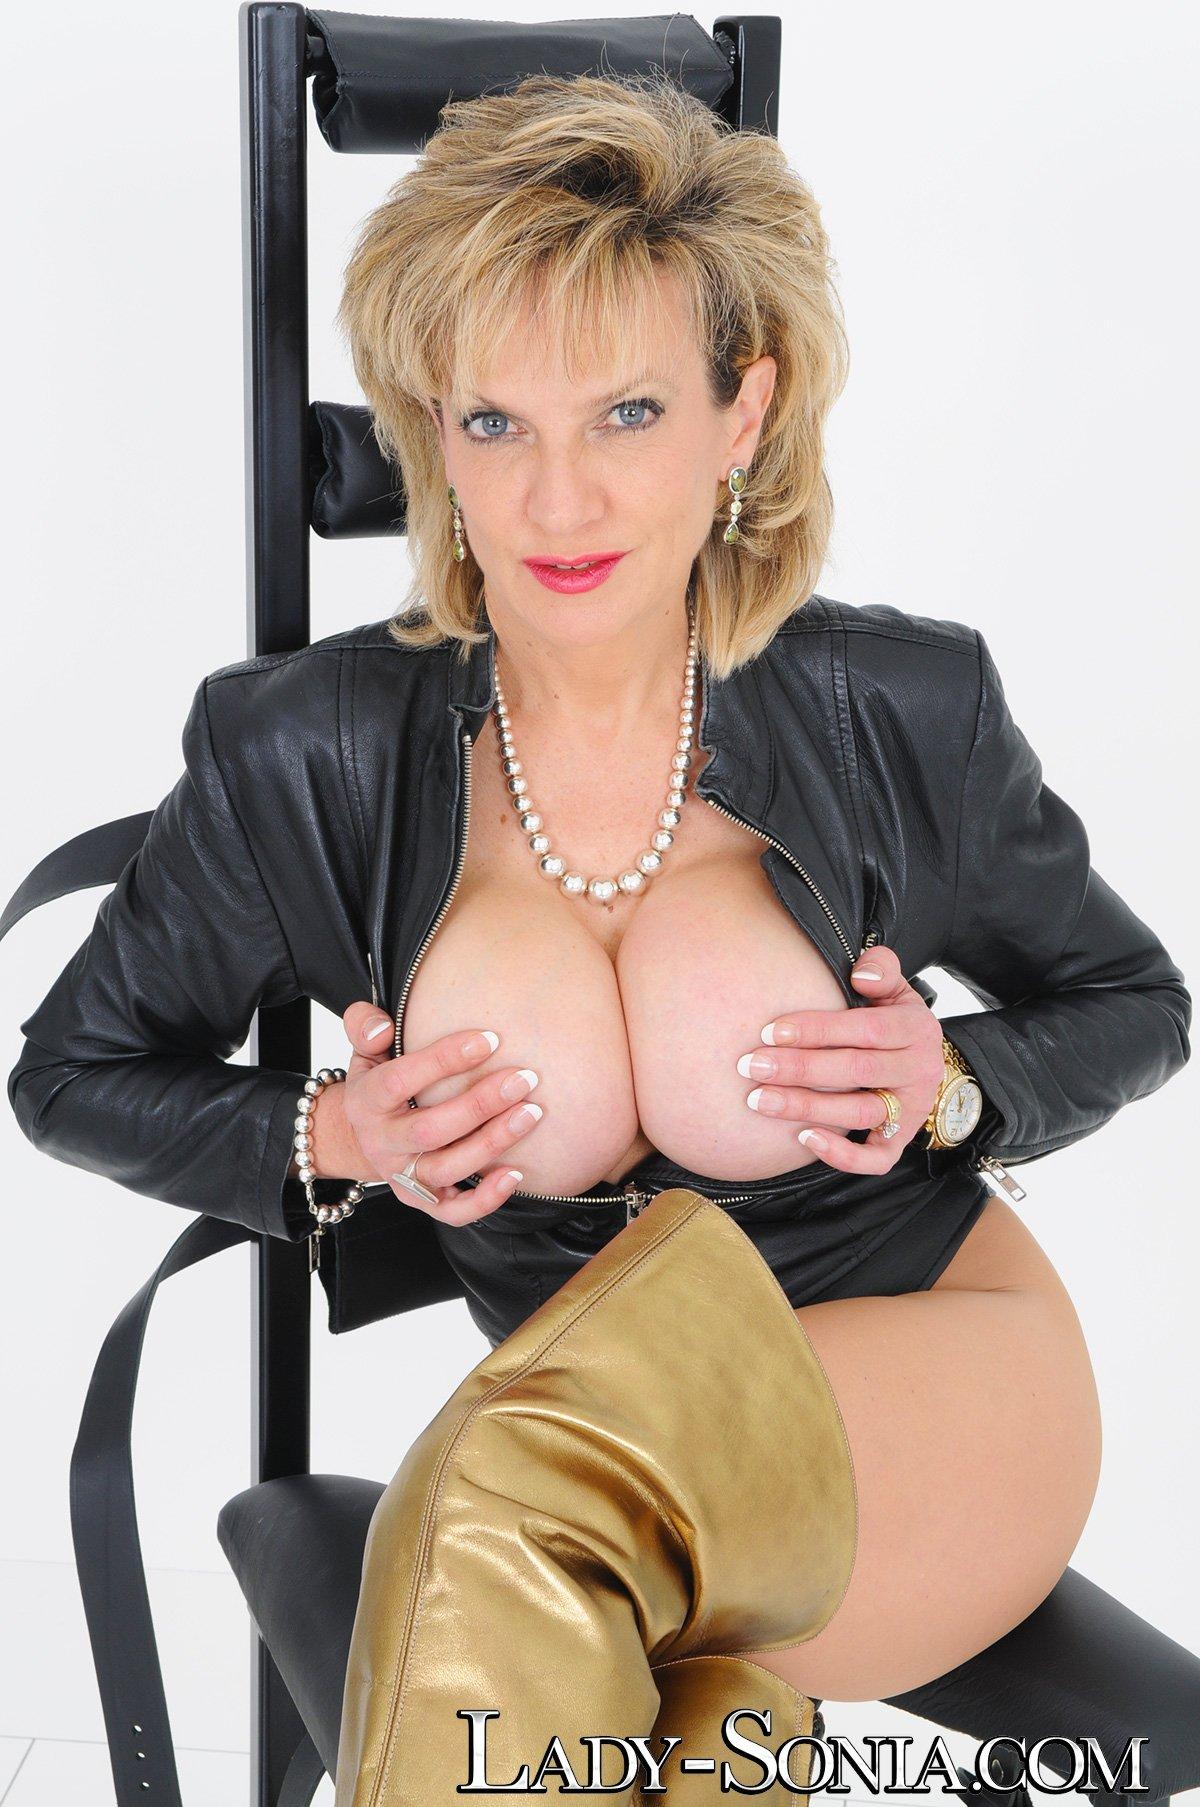 Lady sonia lucky twitter follower blowjob handjob massage 2